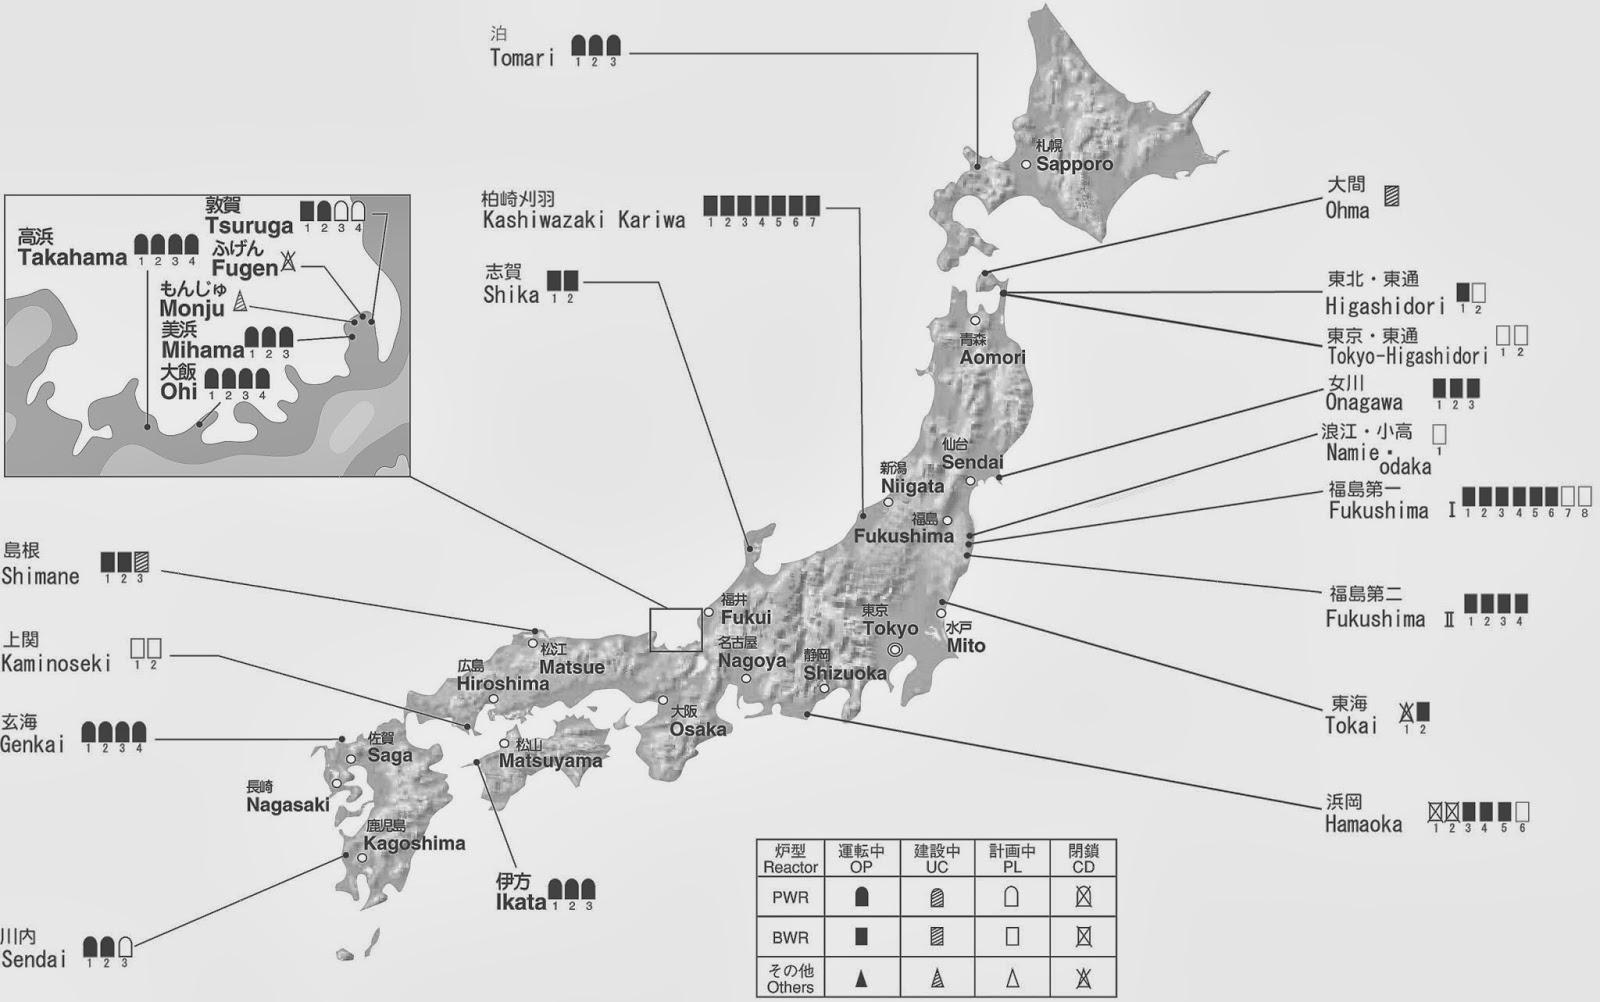 Japan Editor Tokai No 2 Nuclear Plant